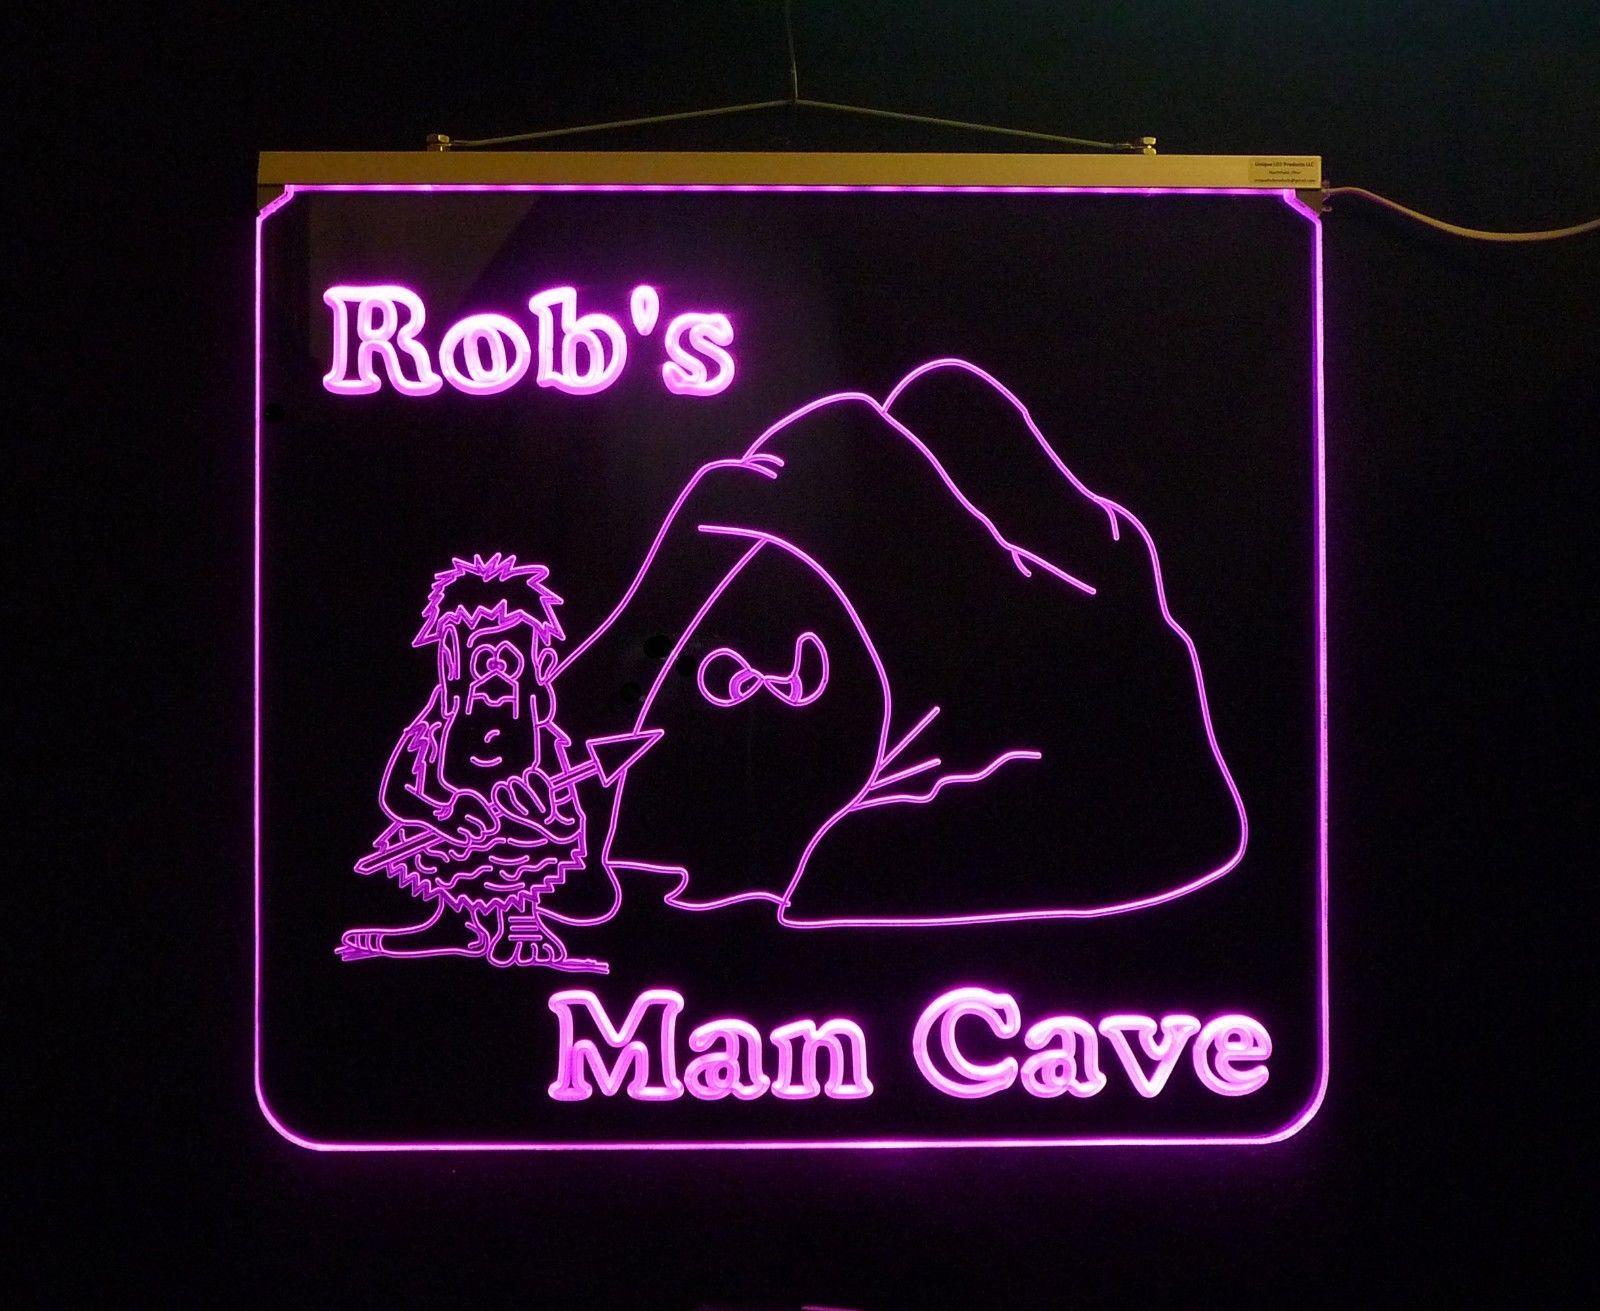 Personalized Man Cave, Garage, Bar, LED Custom Sign image 4